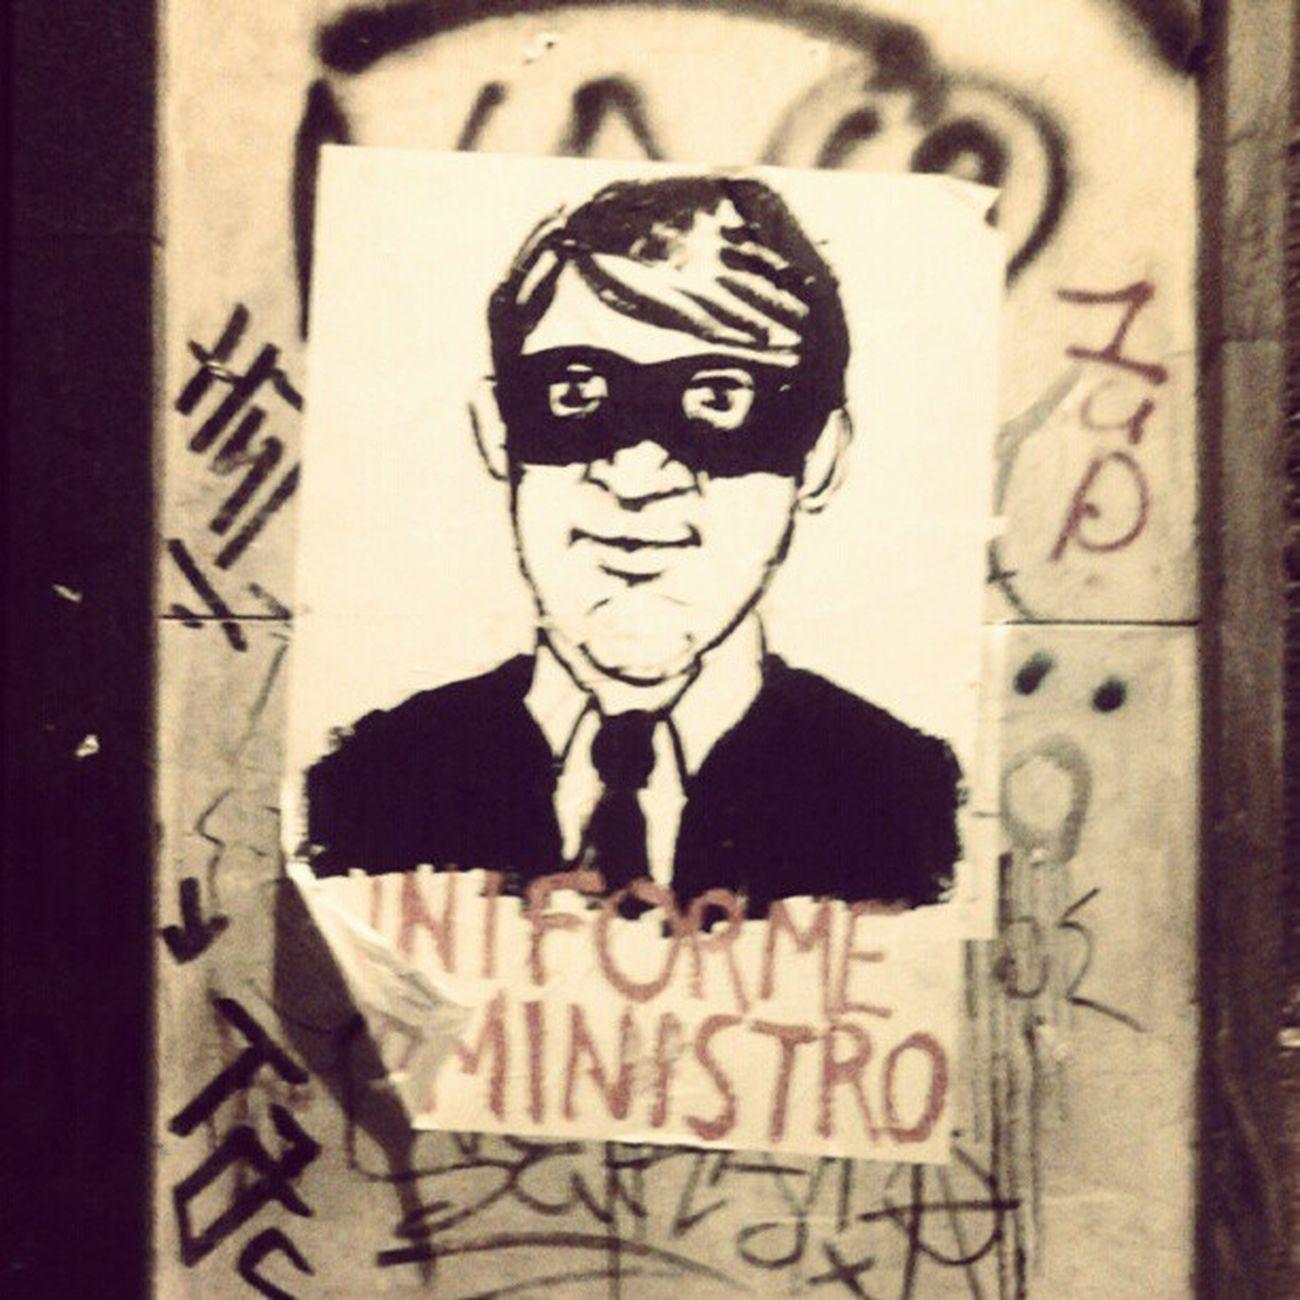 uniforme de ministro Ministro Ministros Bandido Streetart Poster